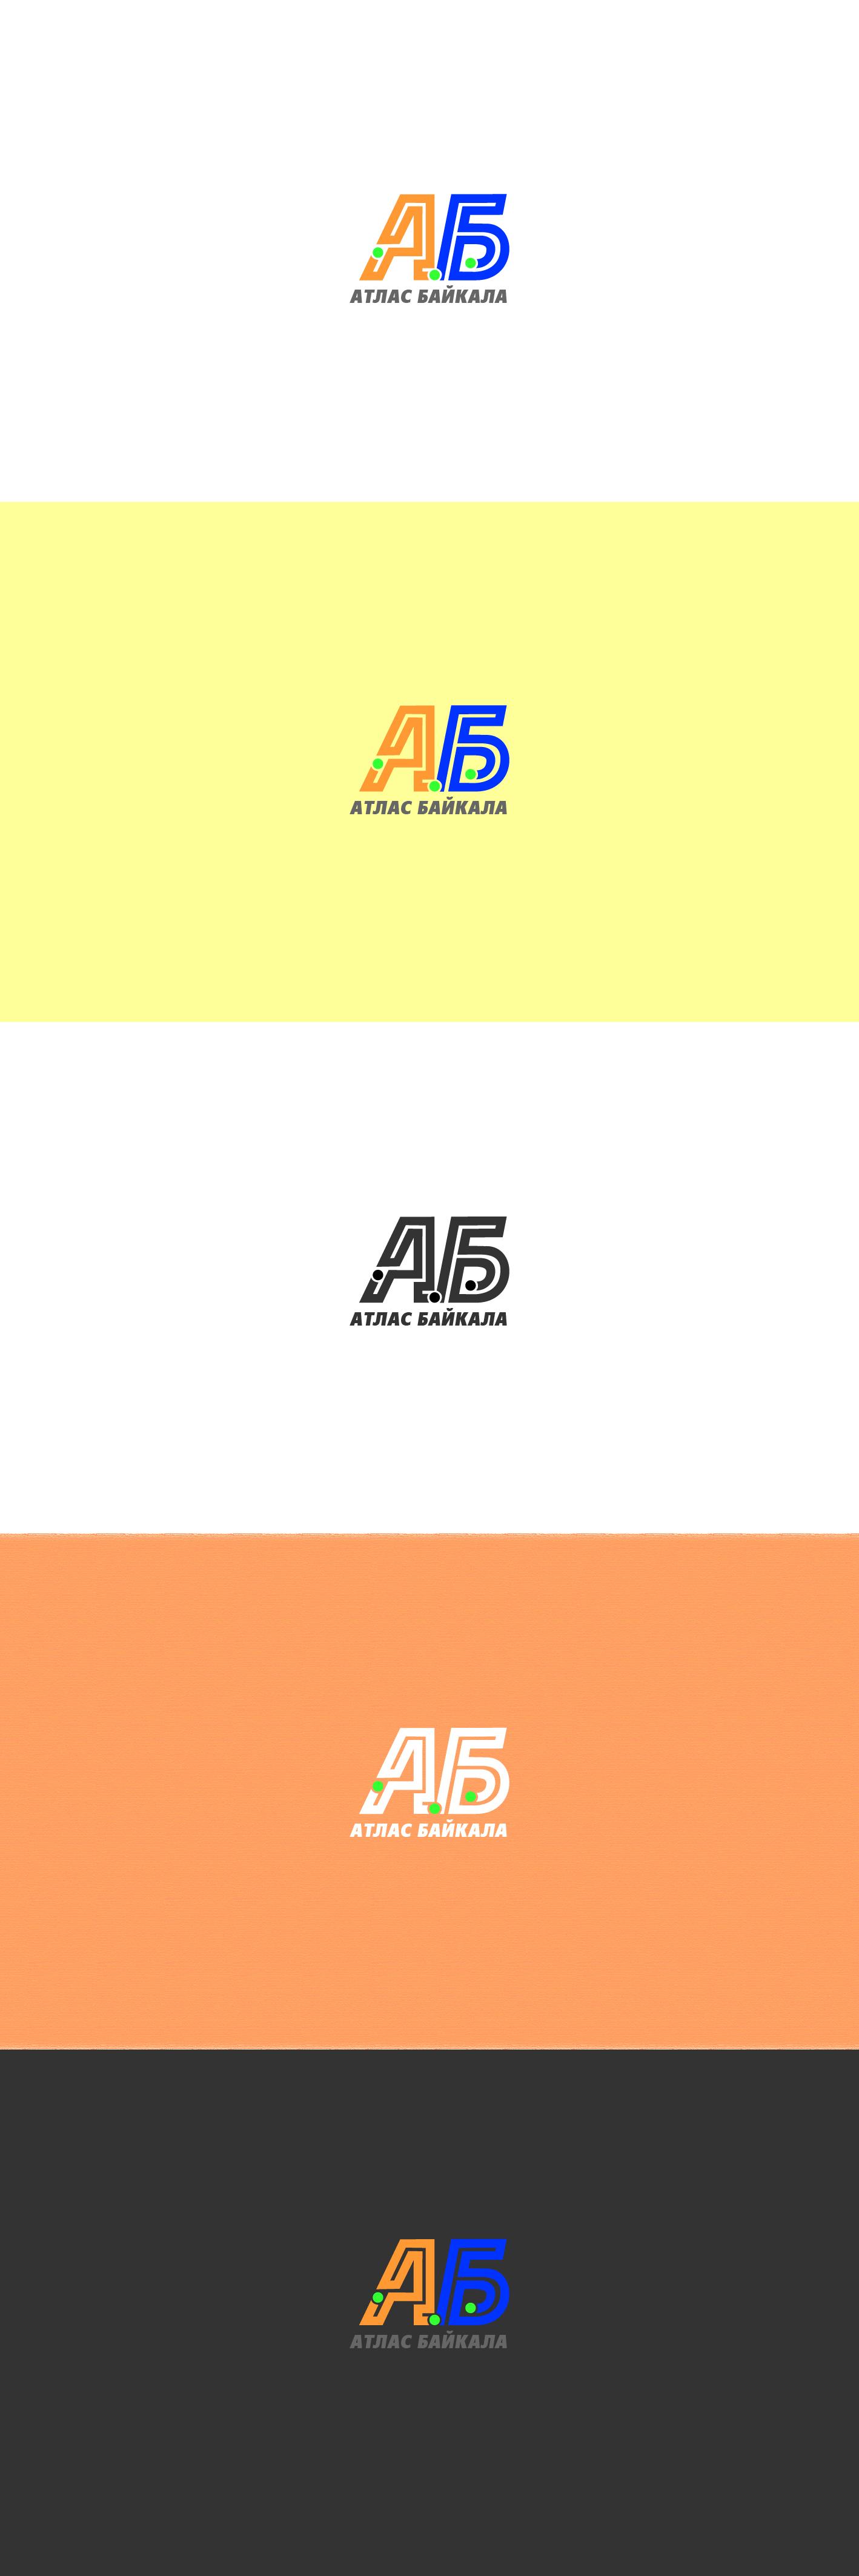 Разработка логотипа Атлас Байкала фото f_0235b0c51e27b873.jpg